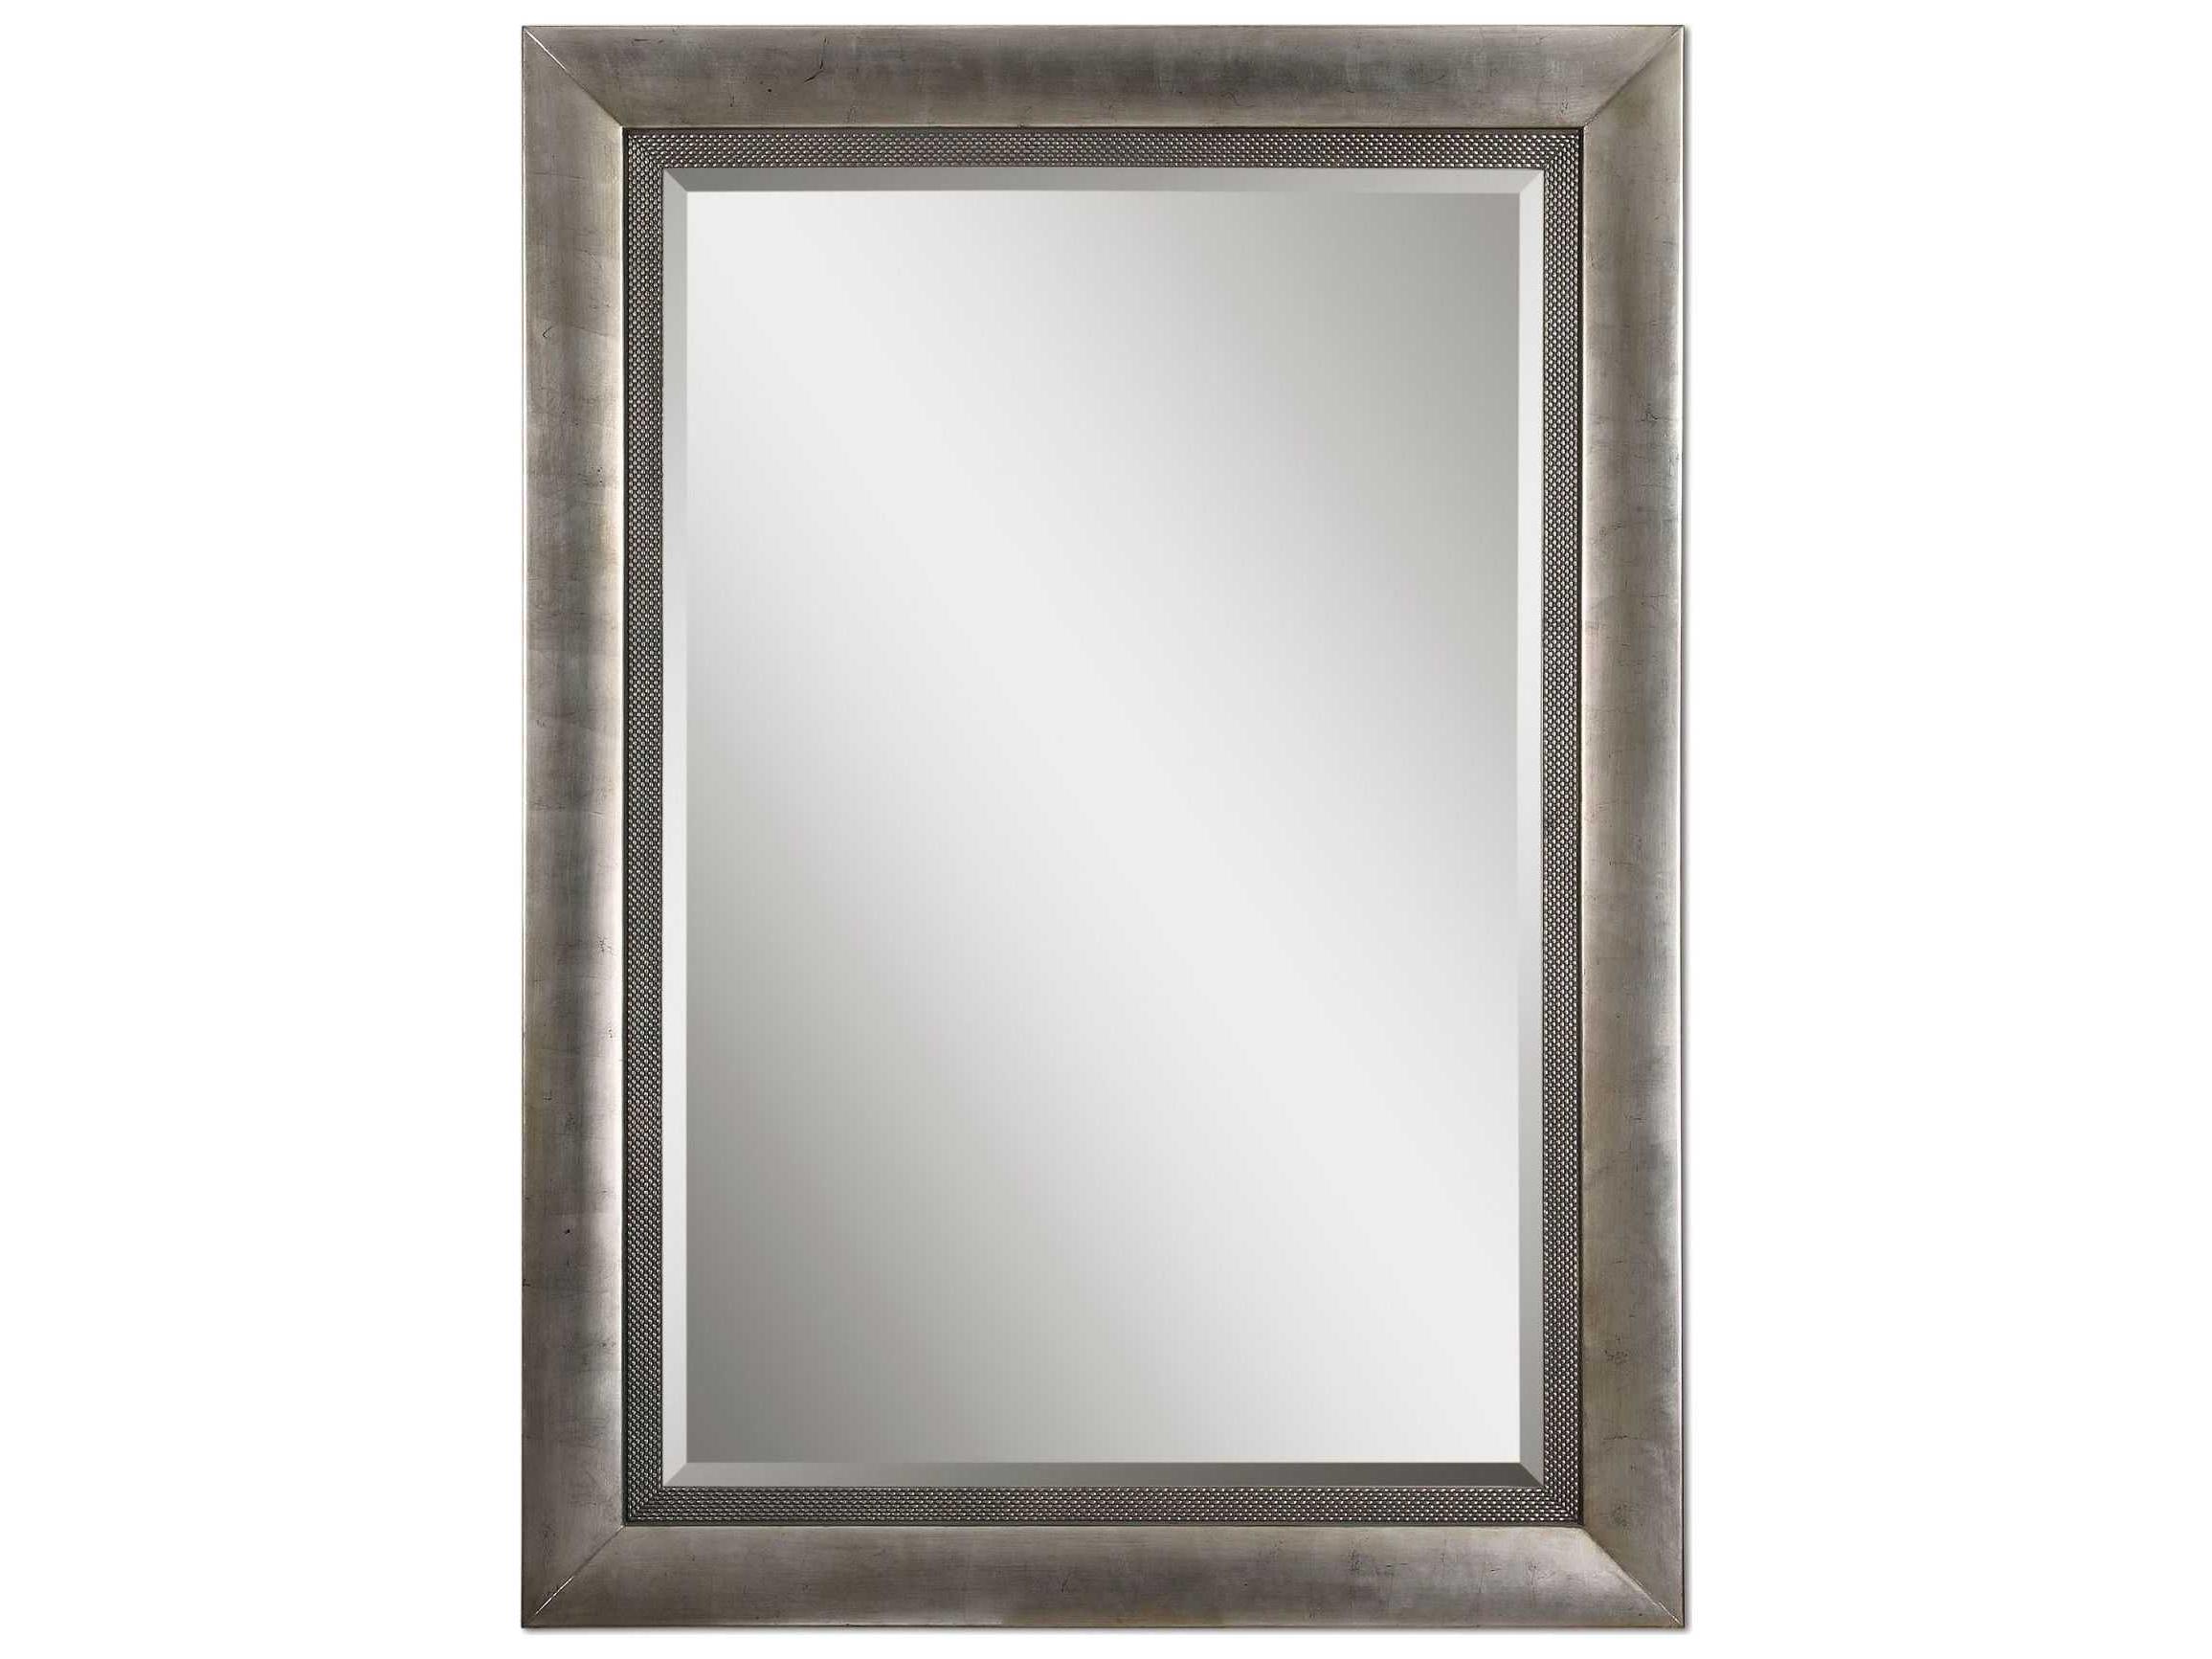 Uttermost Gilford 62 X 86 Antique Silver Wall Mirror In Latest Antique Silver Wall Mirrors (View 16 of 20)